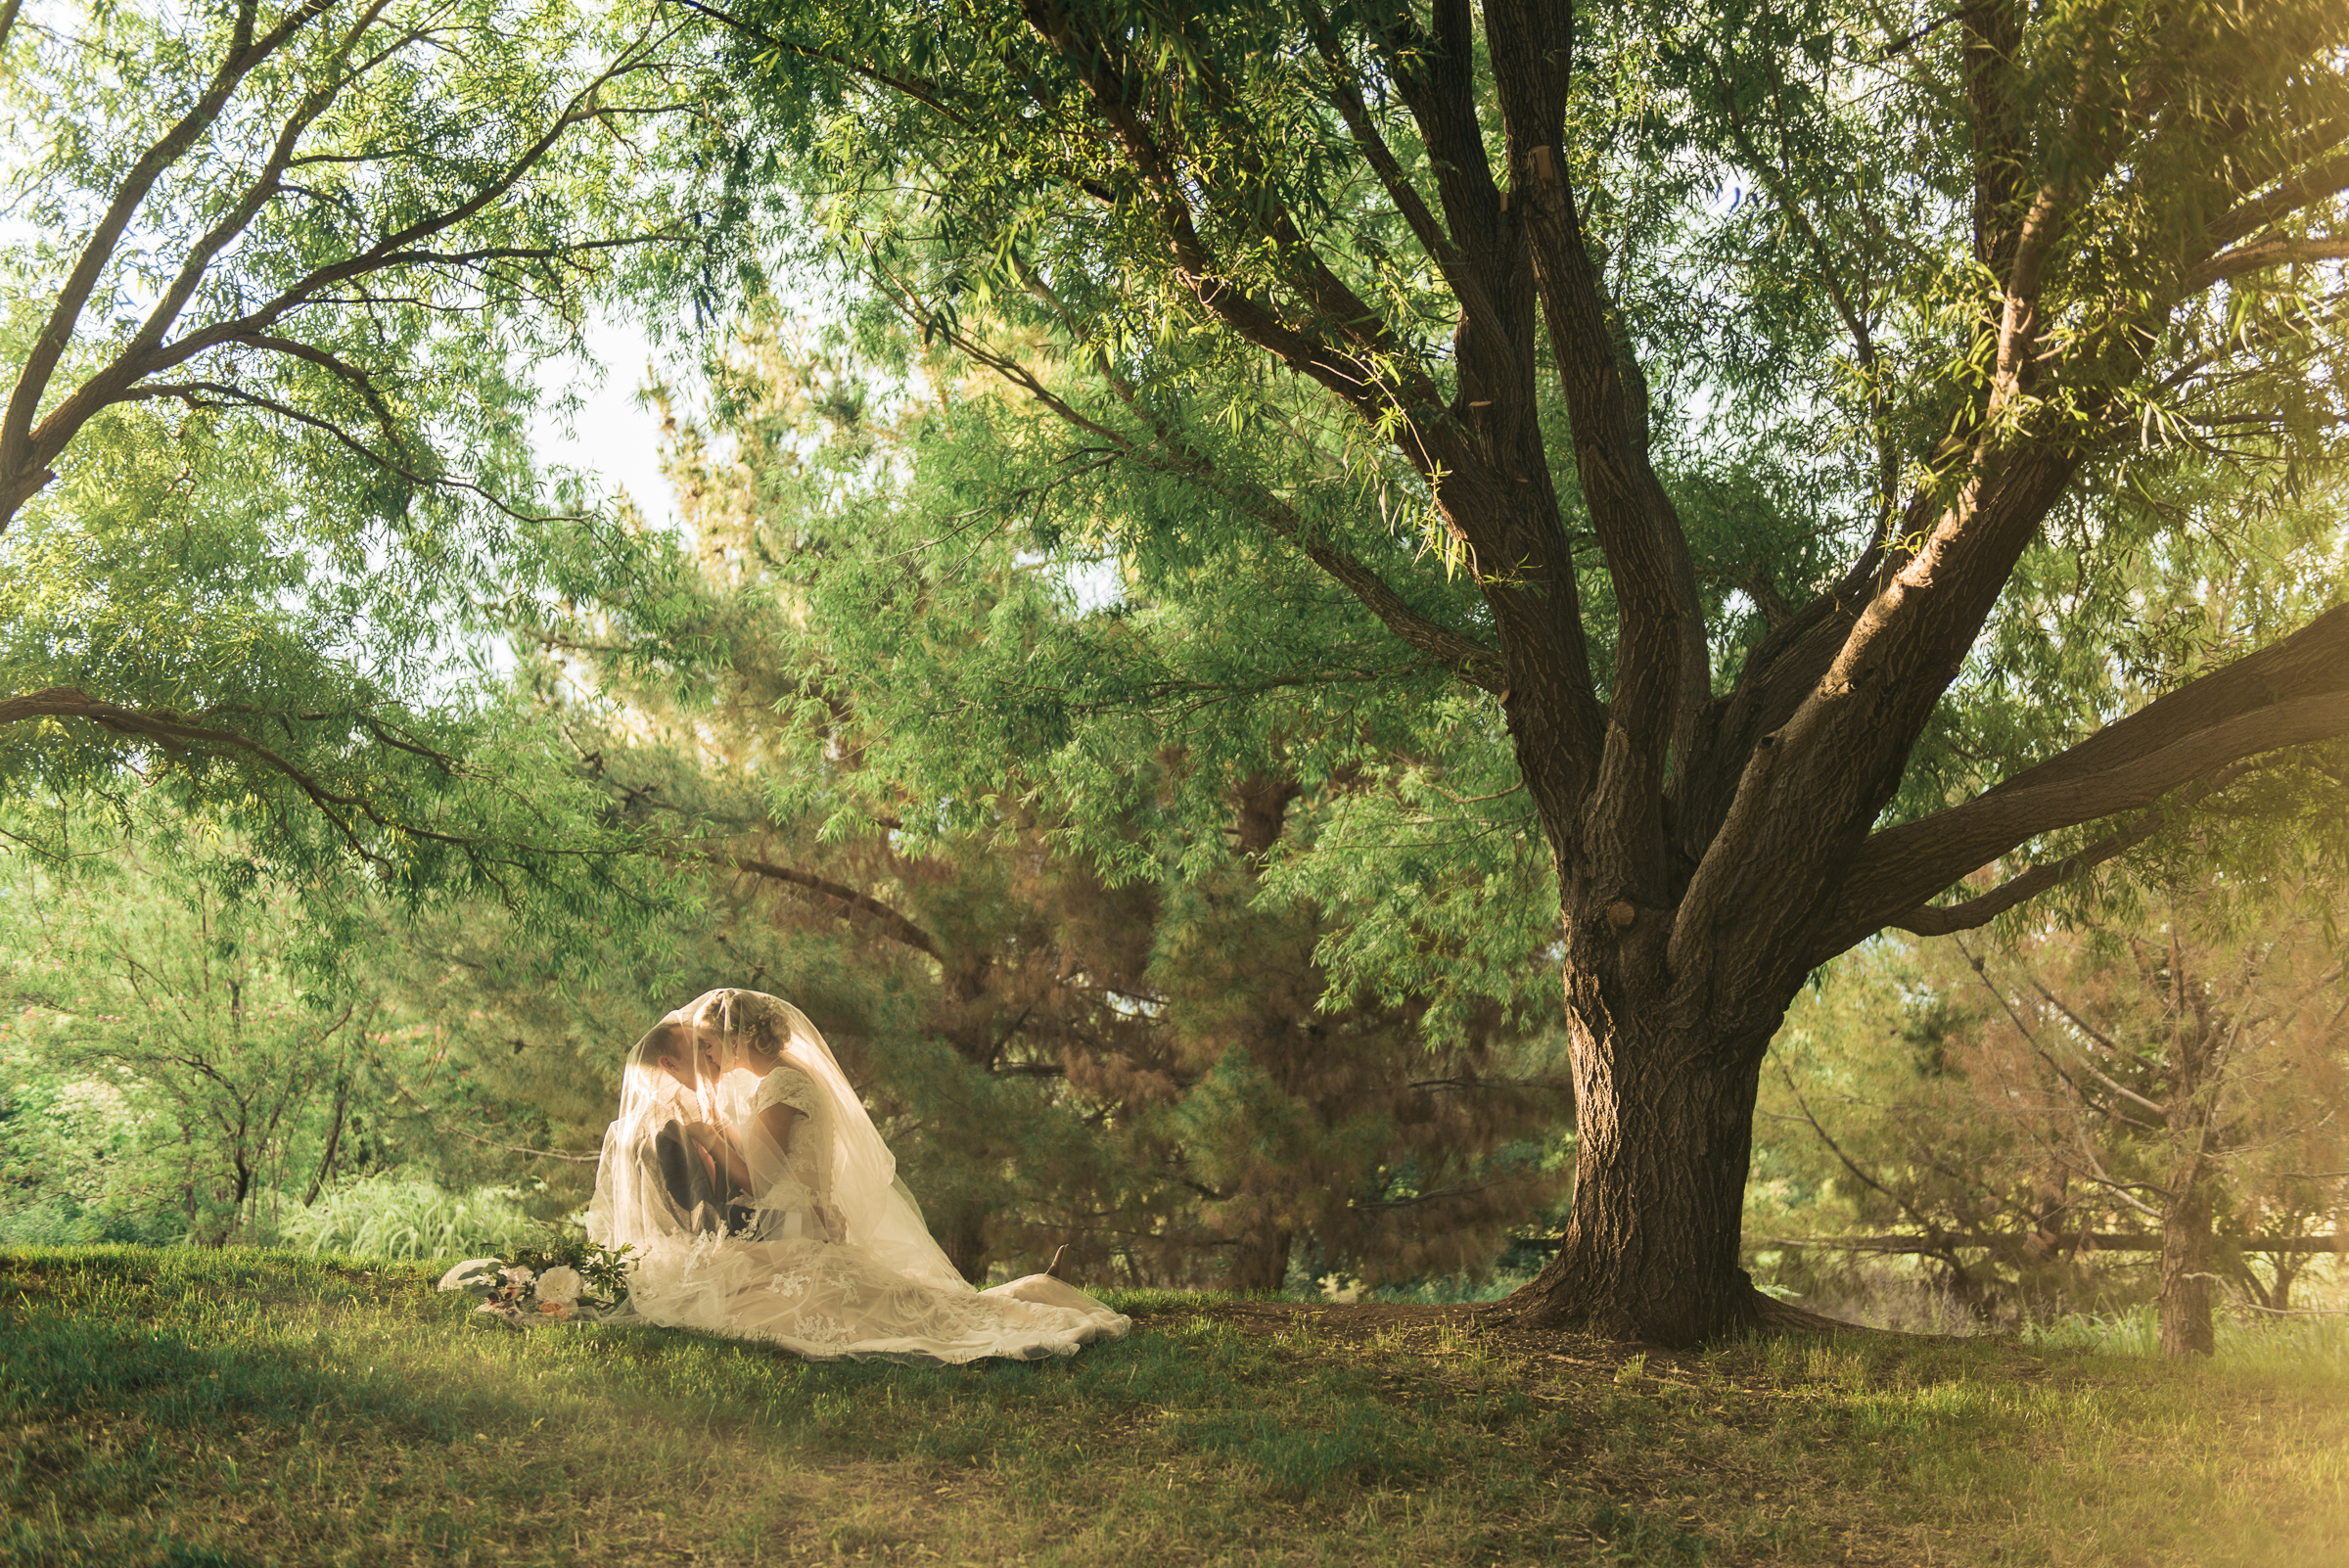 photographybyjamileavitt_wedding_gallery_main.jpg